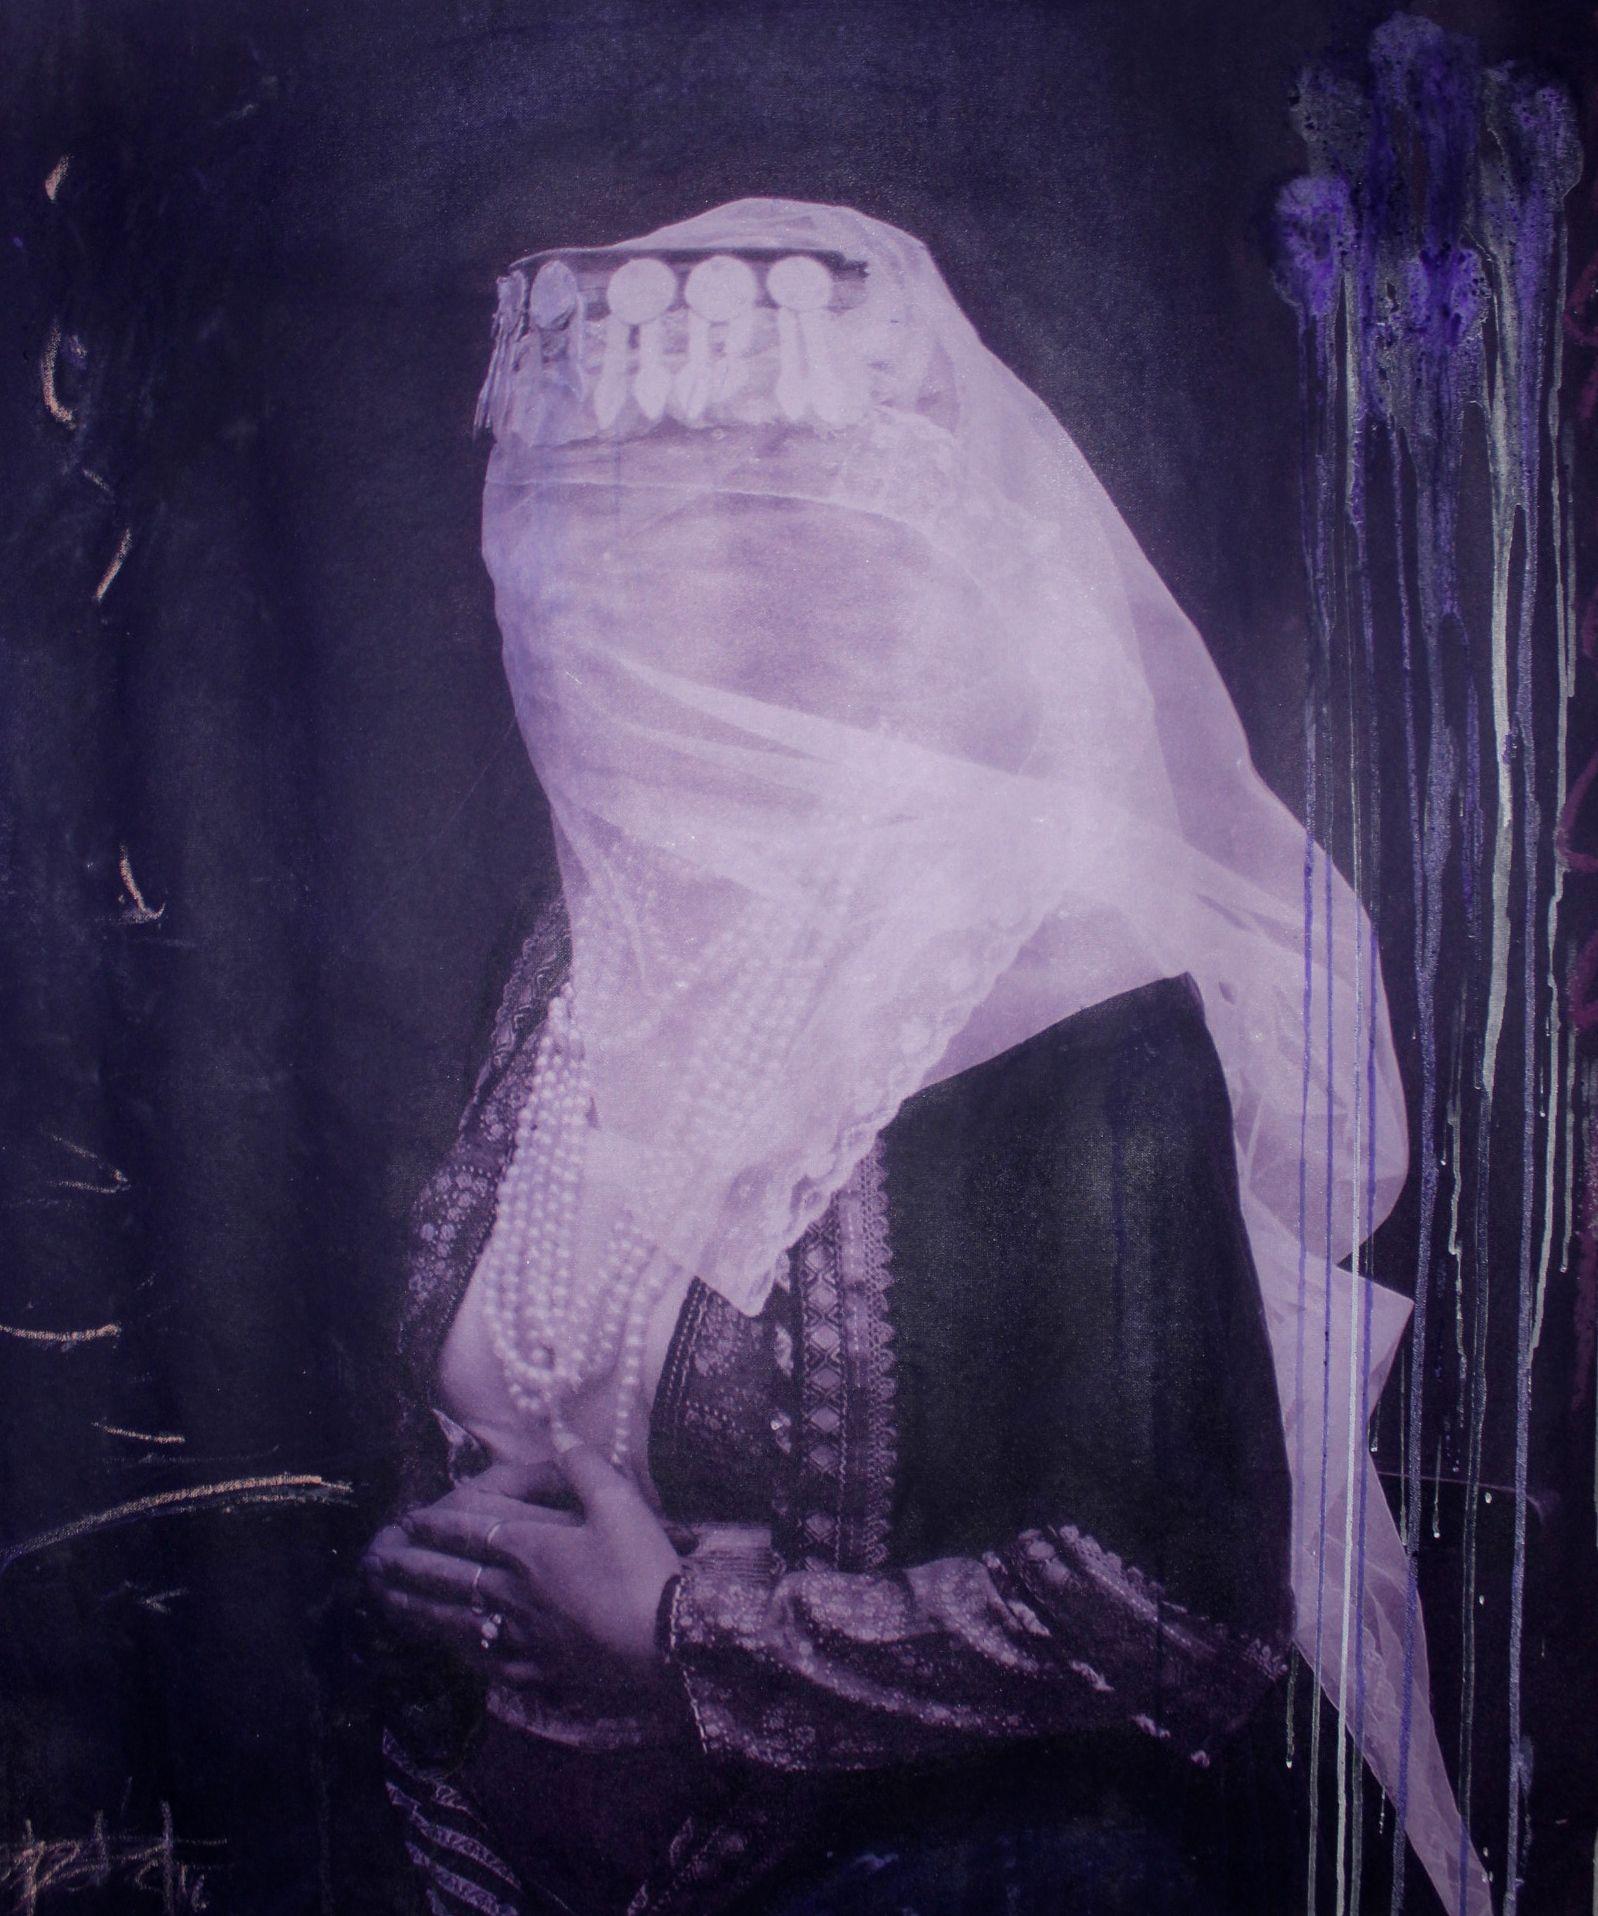 Firouz Farman Farmaian - A Woman with Veil in Purple - 15x14